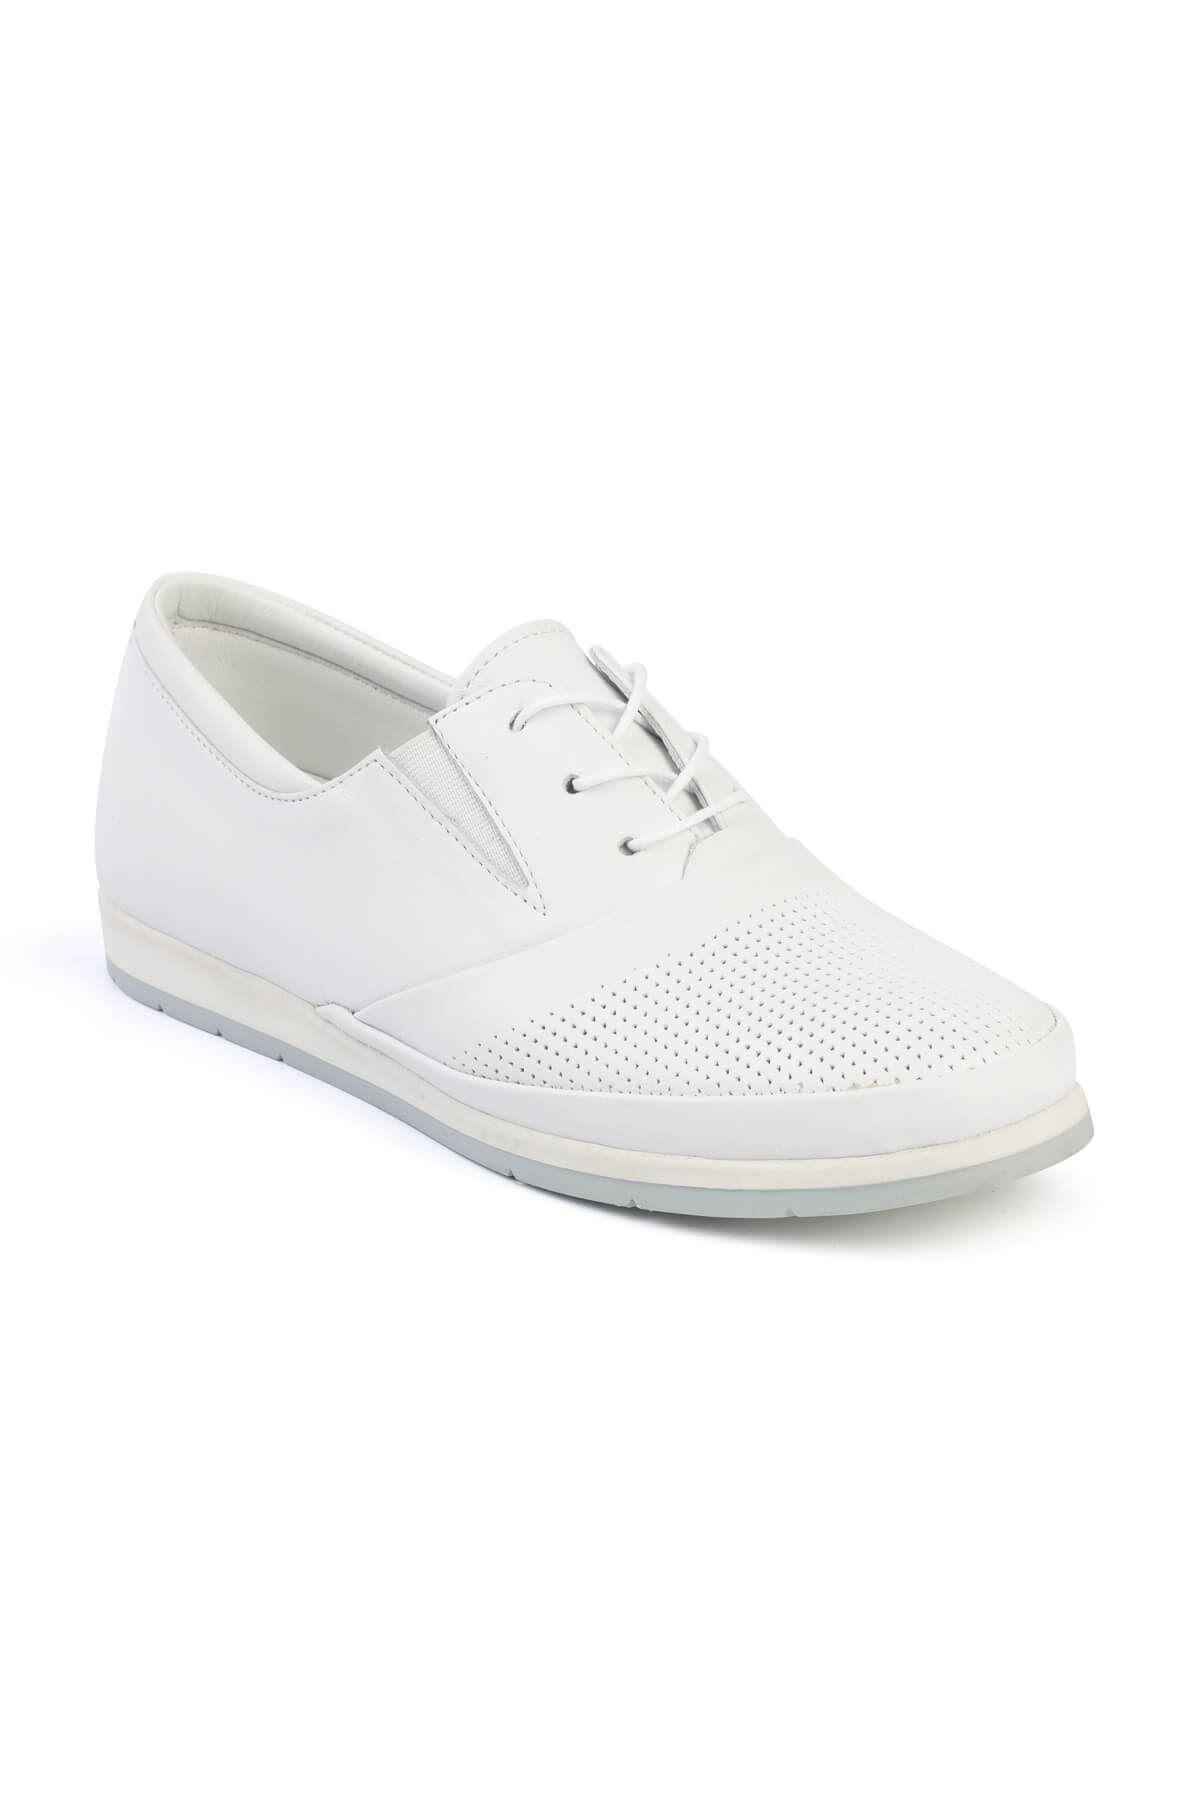 Libero FMS201 Beyaz Casual Ayakkabı